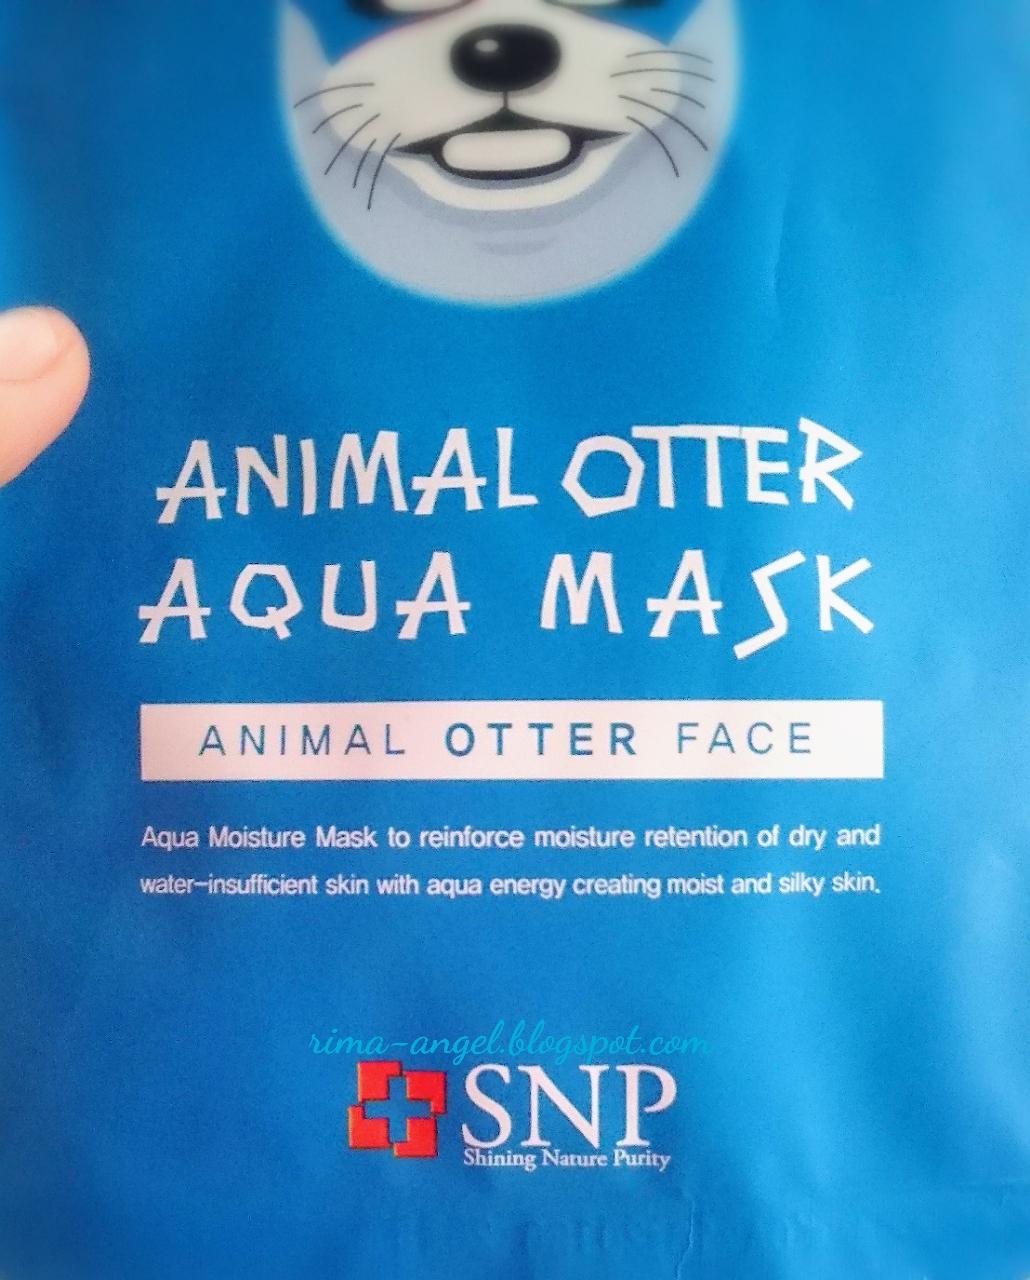 Web Versi Mobile Snp Animal Mask Masker Face Satu Ini Cocoknya Untuk Kulit Kering Sedangkan Saya Mempunyai Berminyak Tetapi Berharap Cocok Dengan Dalam Artian Tidak